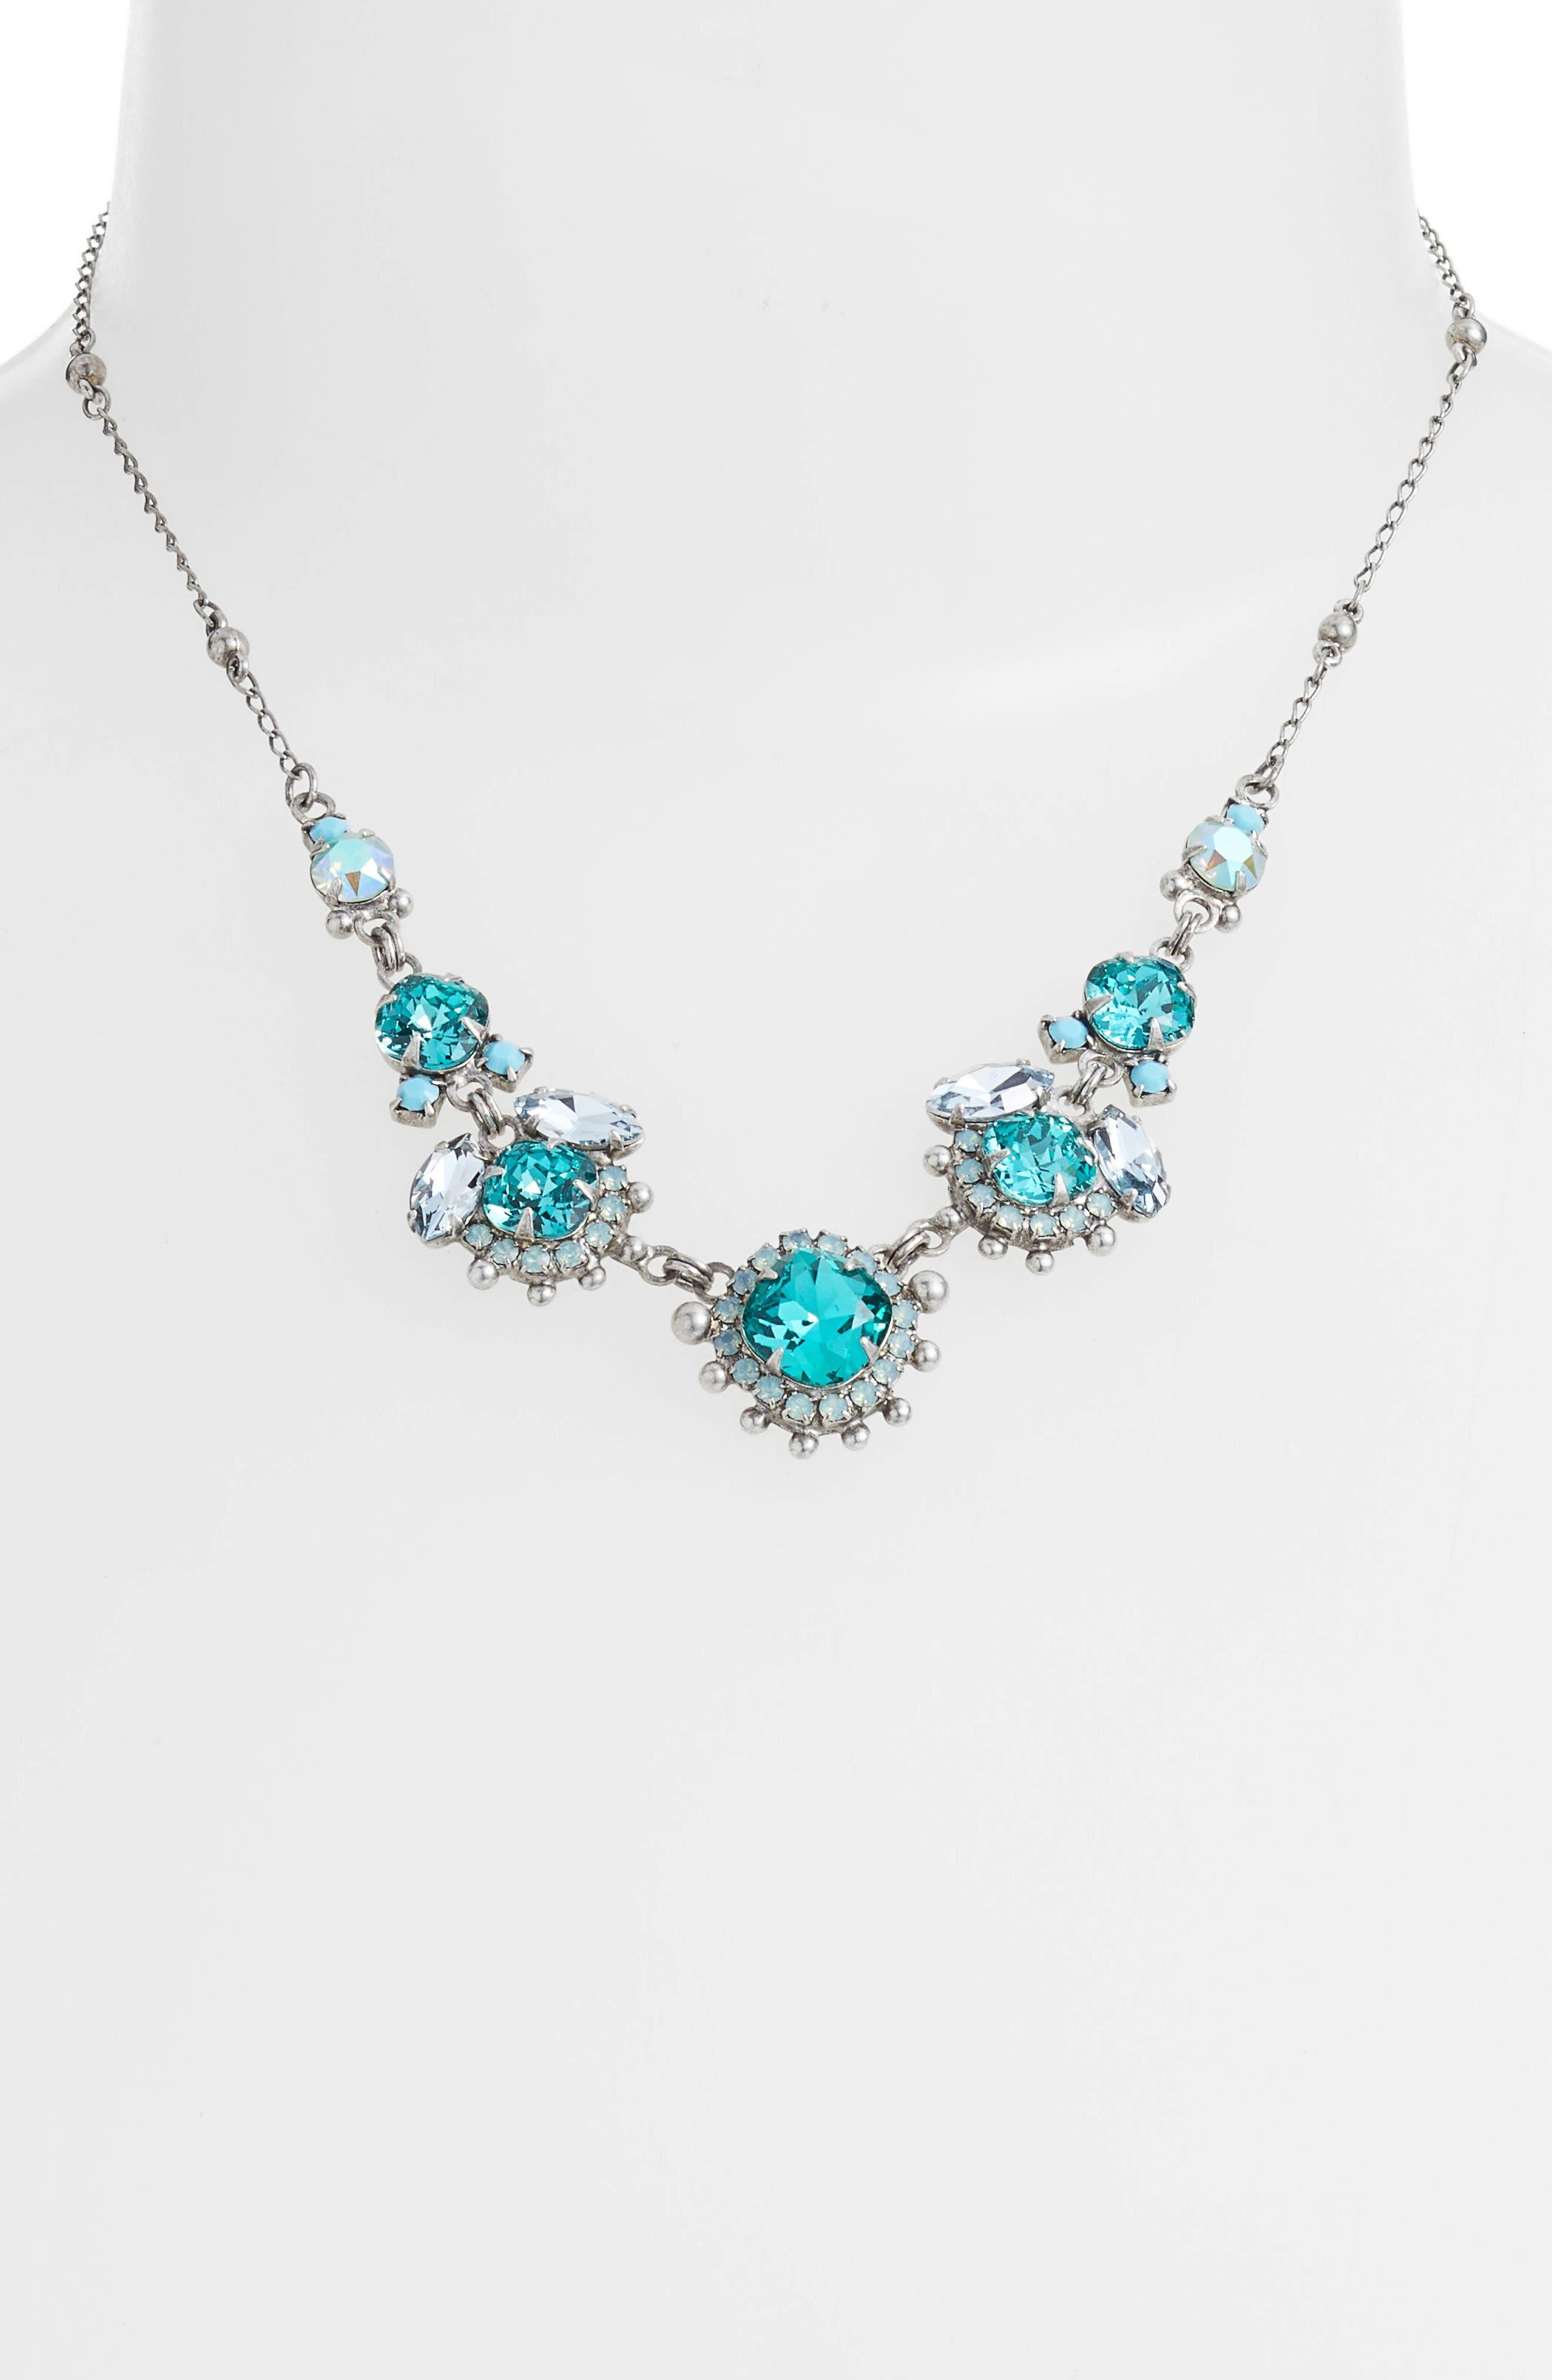 California Poppy Crystal Necklace,                             Main thumbnail 1, color,                             Blue-Green